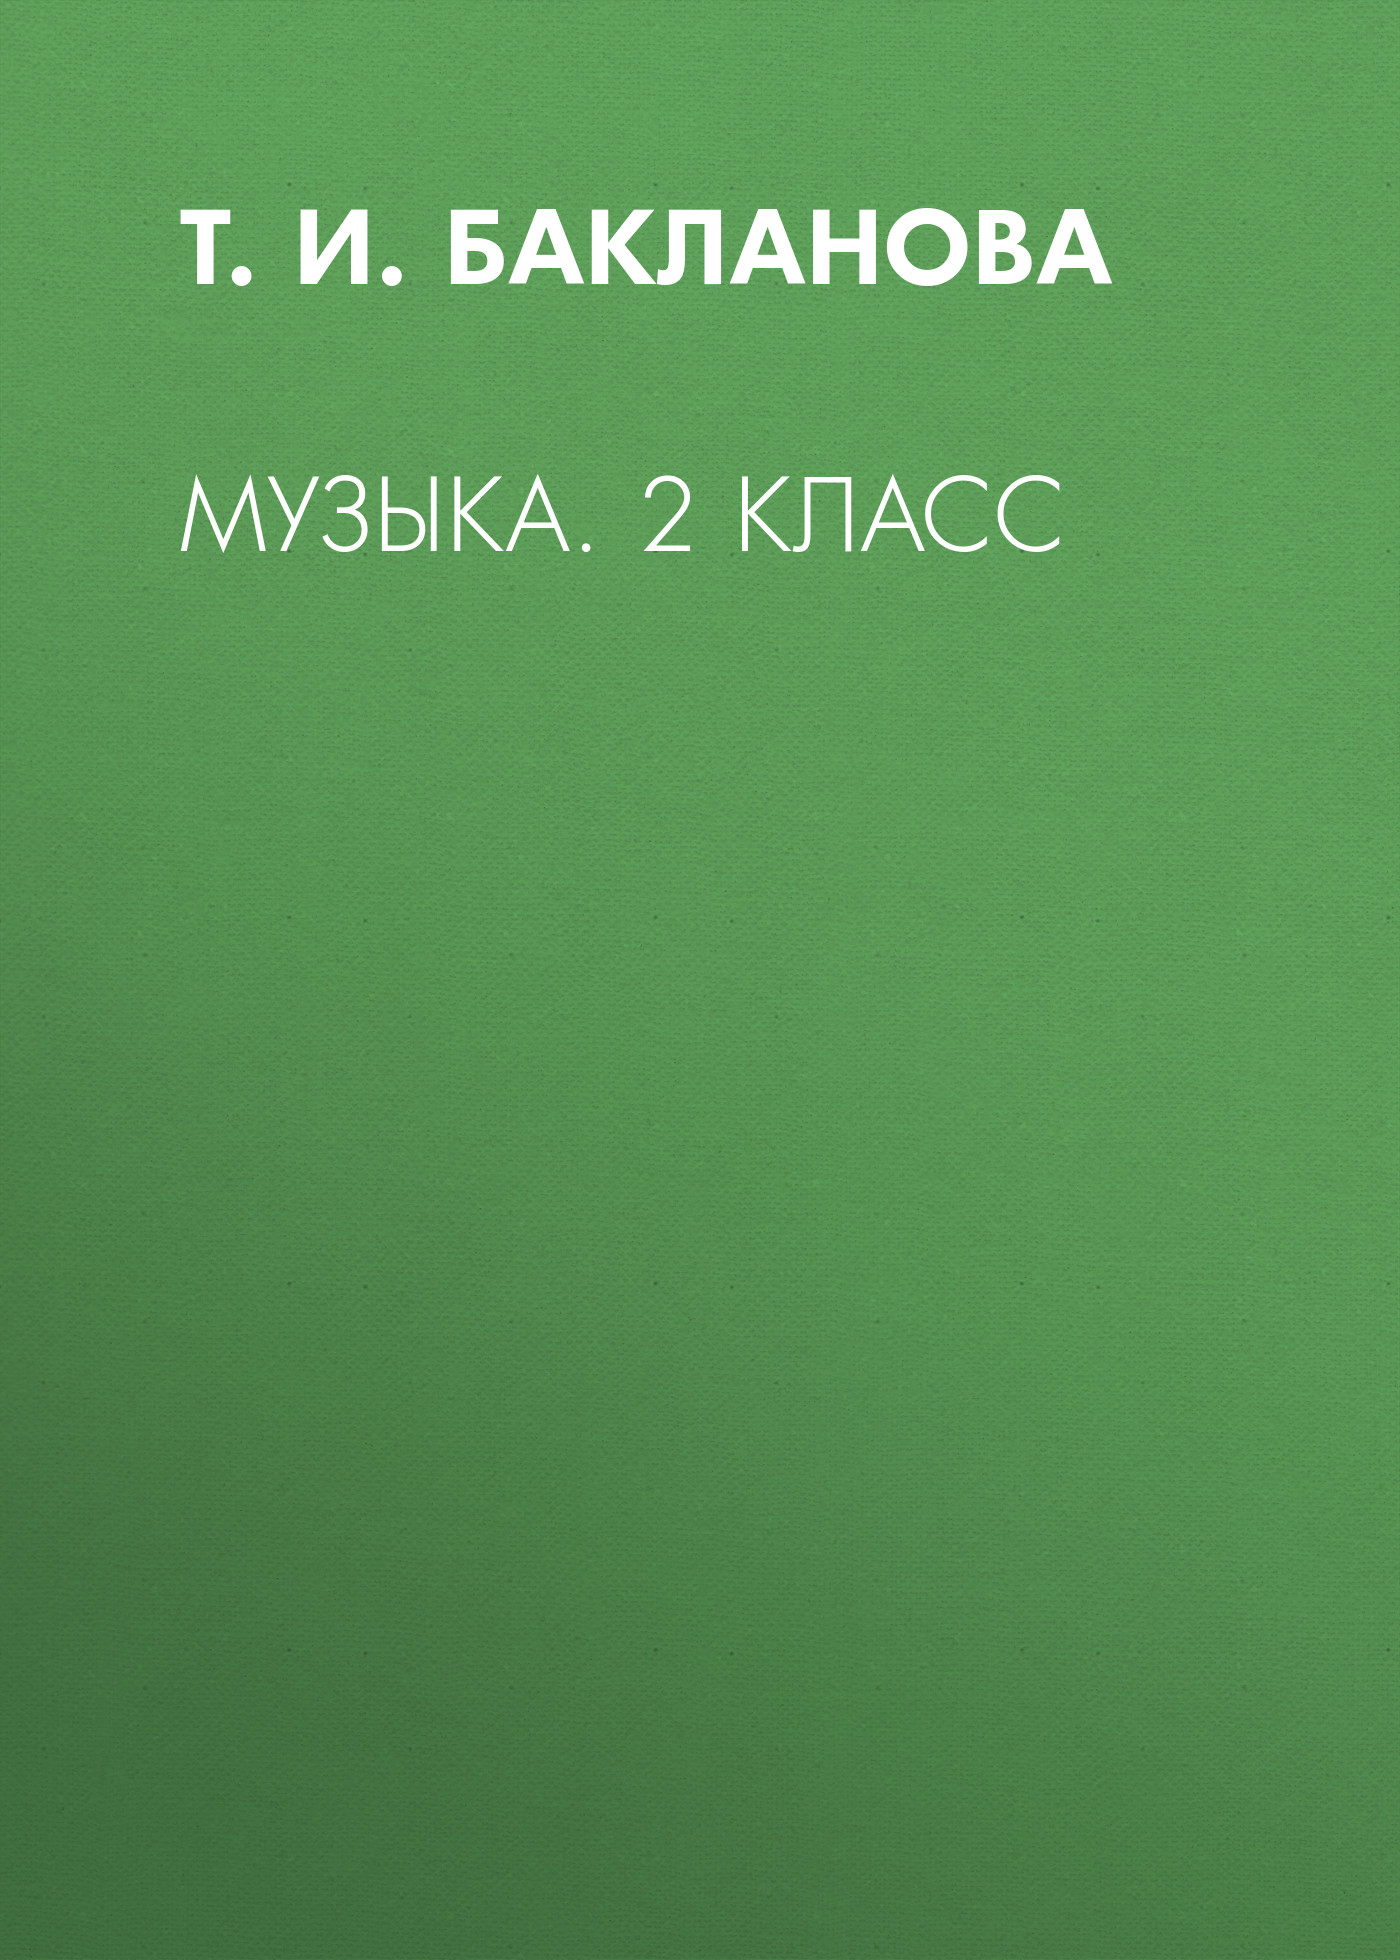 Т. И. Бакланова Музыка. 2 класс бакланова т музыка для детей муз путешествия и встречи isbn 9785170597871